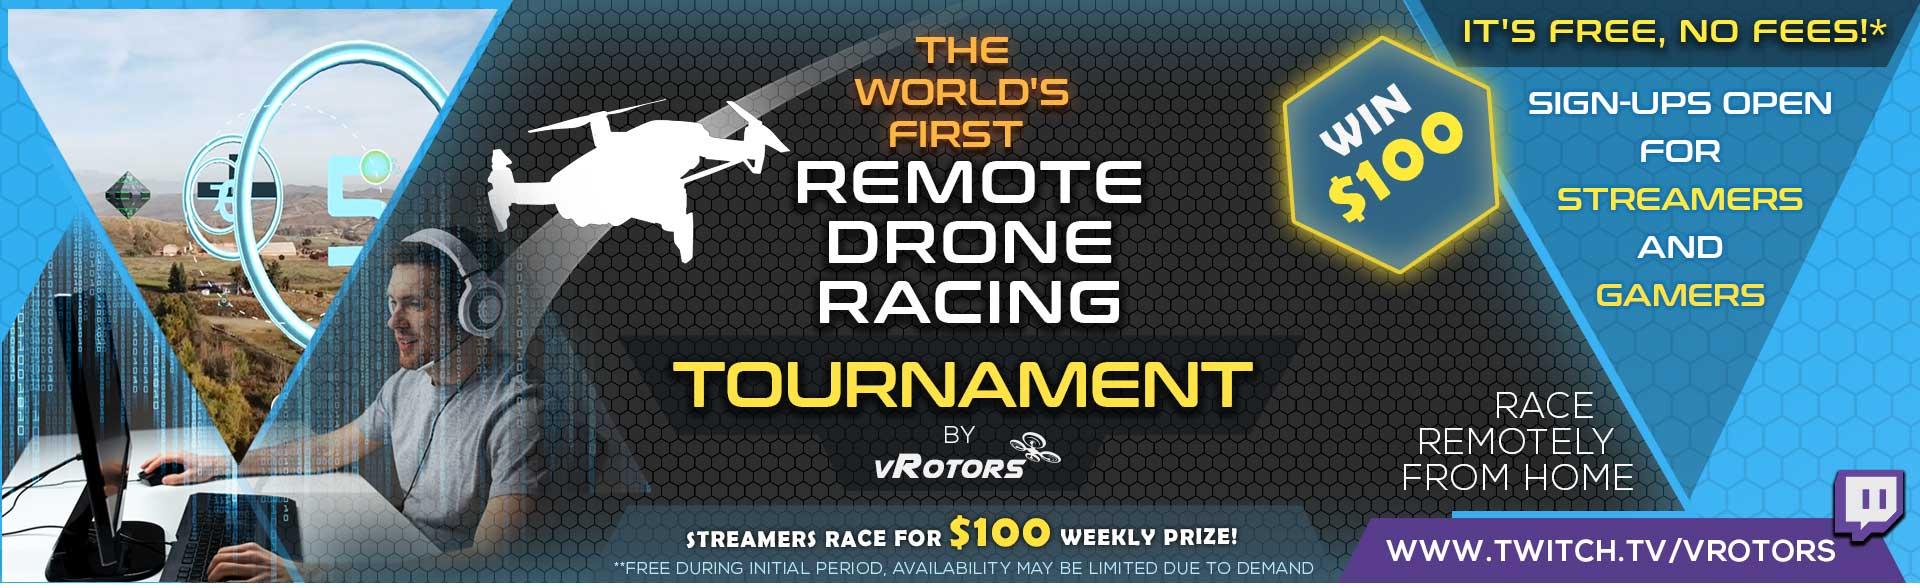 tournament page promo